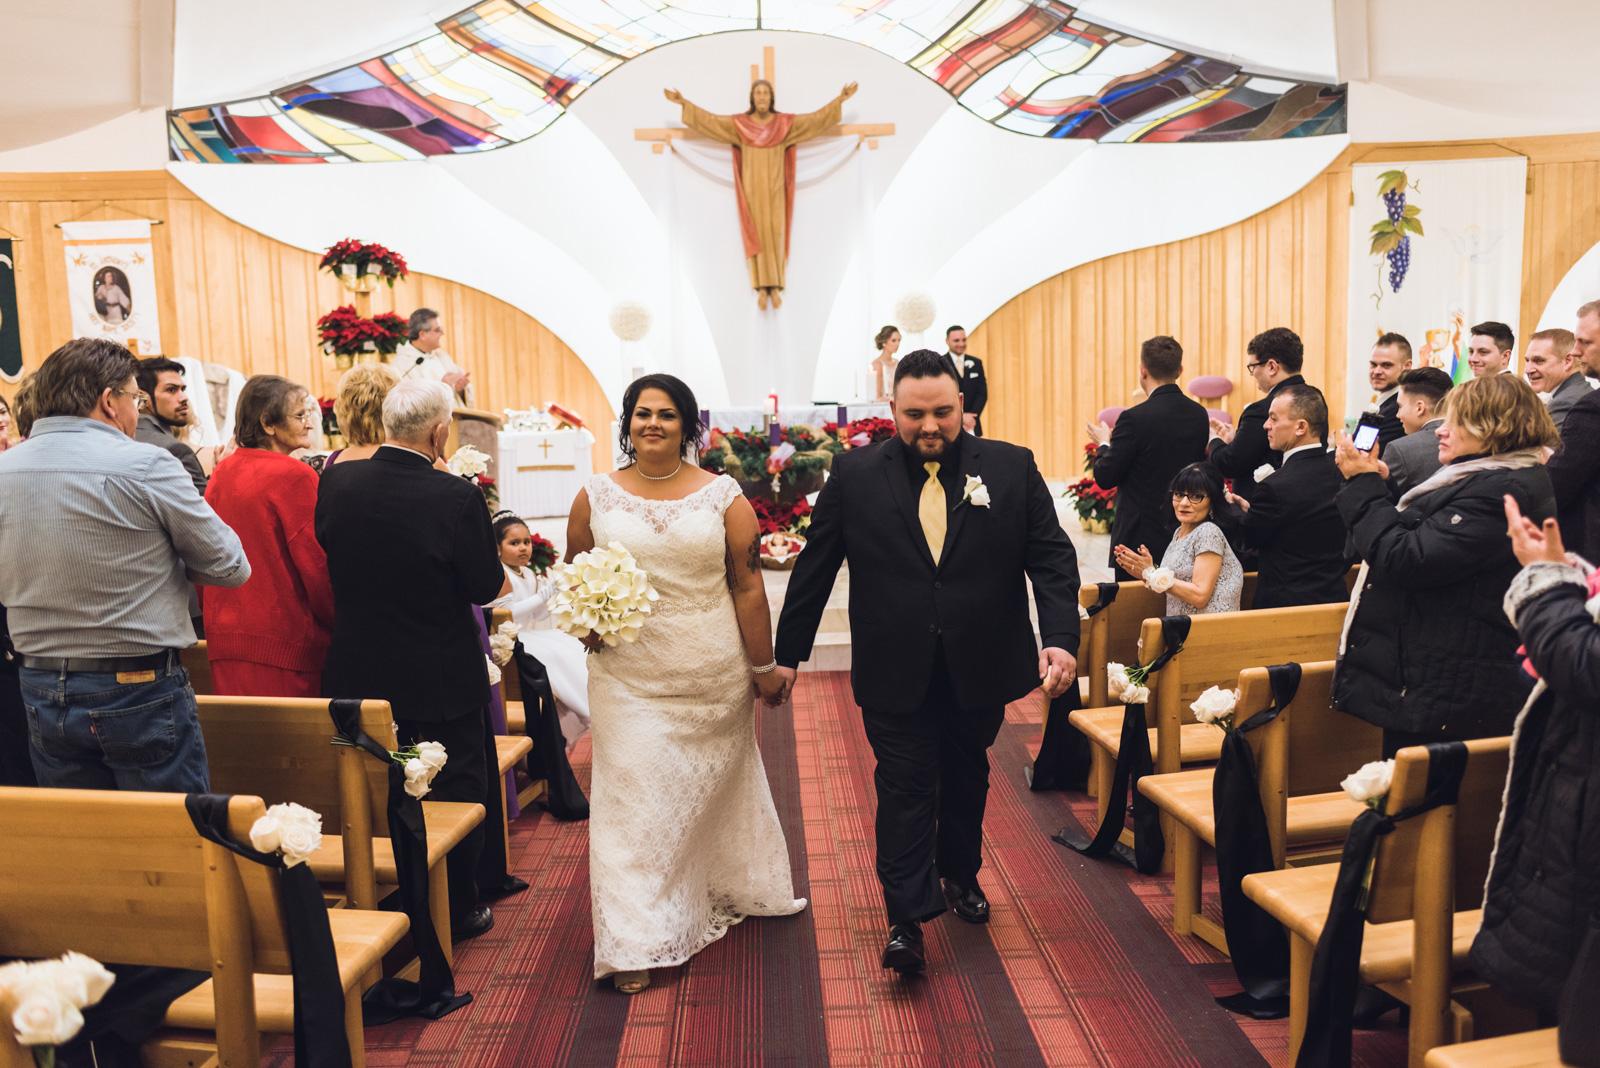 rheana-chris-wedding-blog-154.jpg